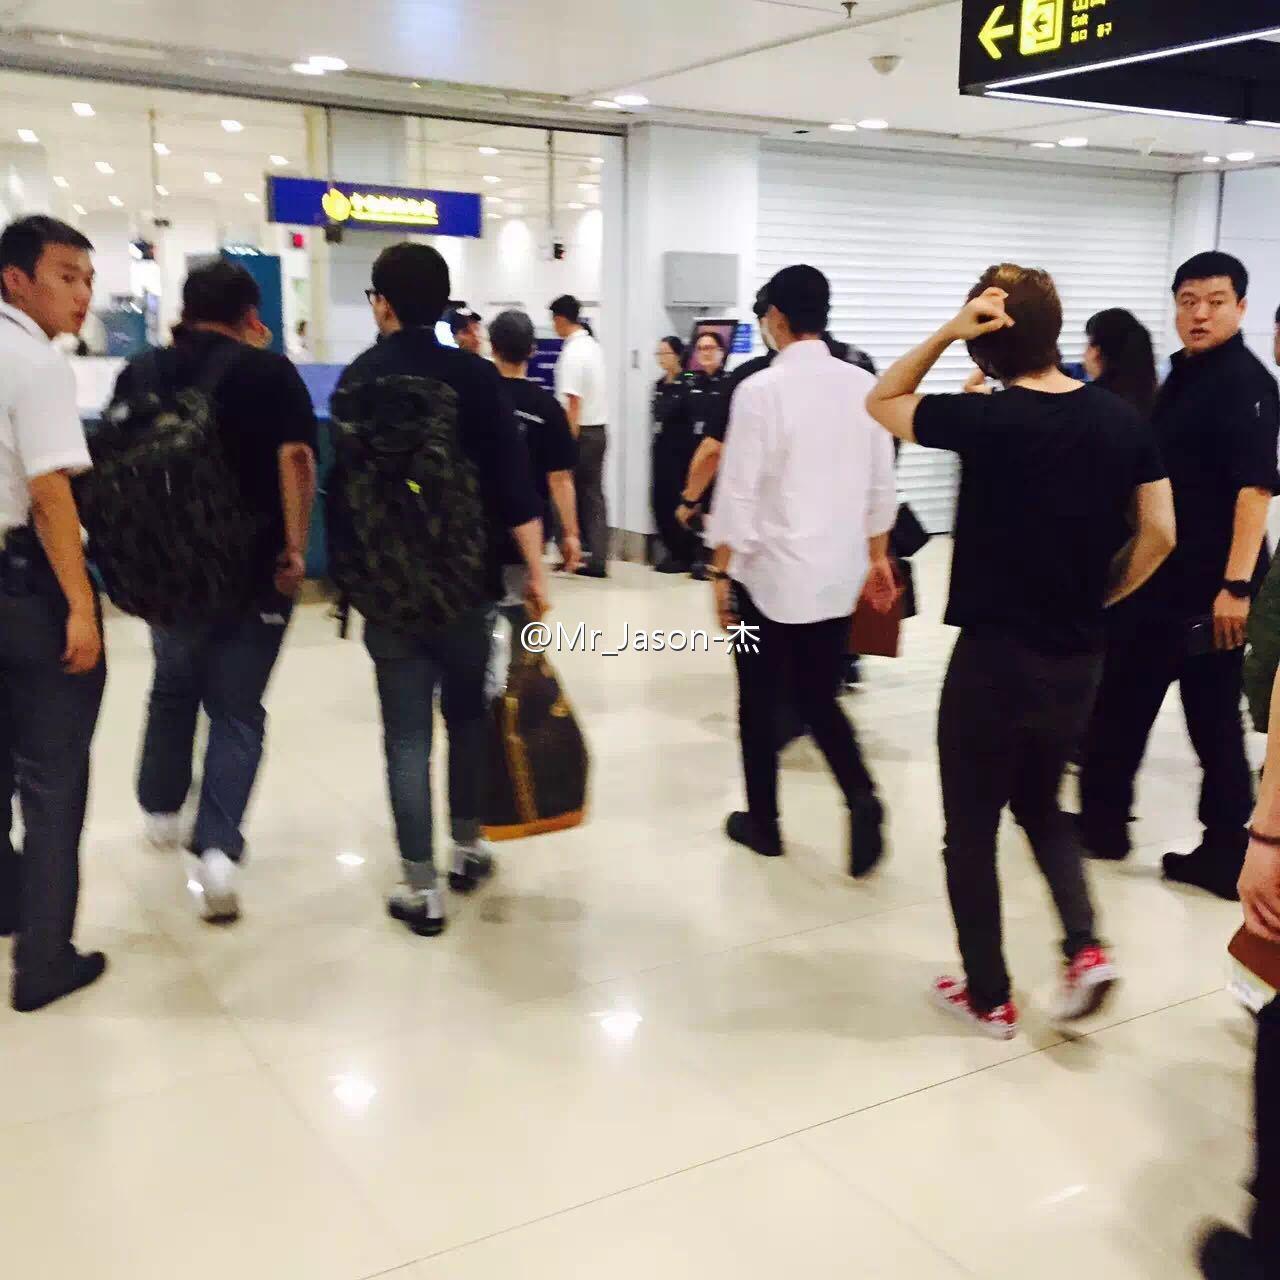 BIGBANG Arrival Chongqing 2016-06-30 (5)